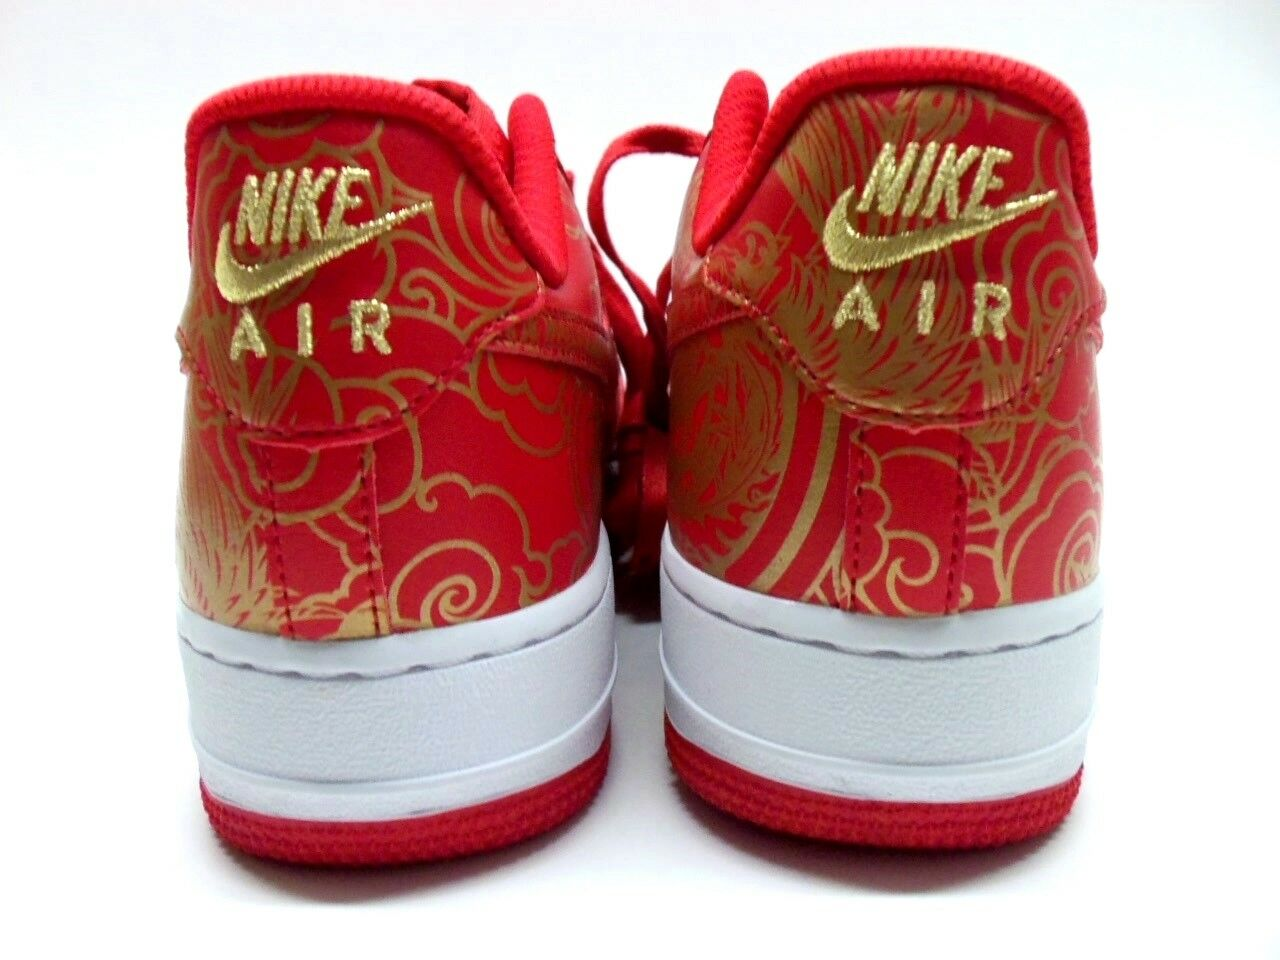 Nike air force 1 id id id chinese new year ROT / gold-Weiß größe für männer 8 [919729-992] b631d9